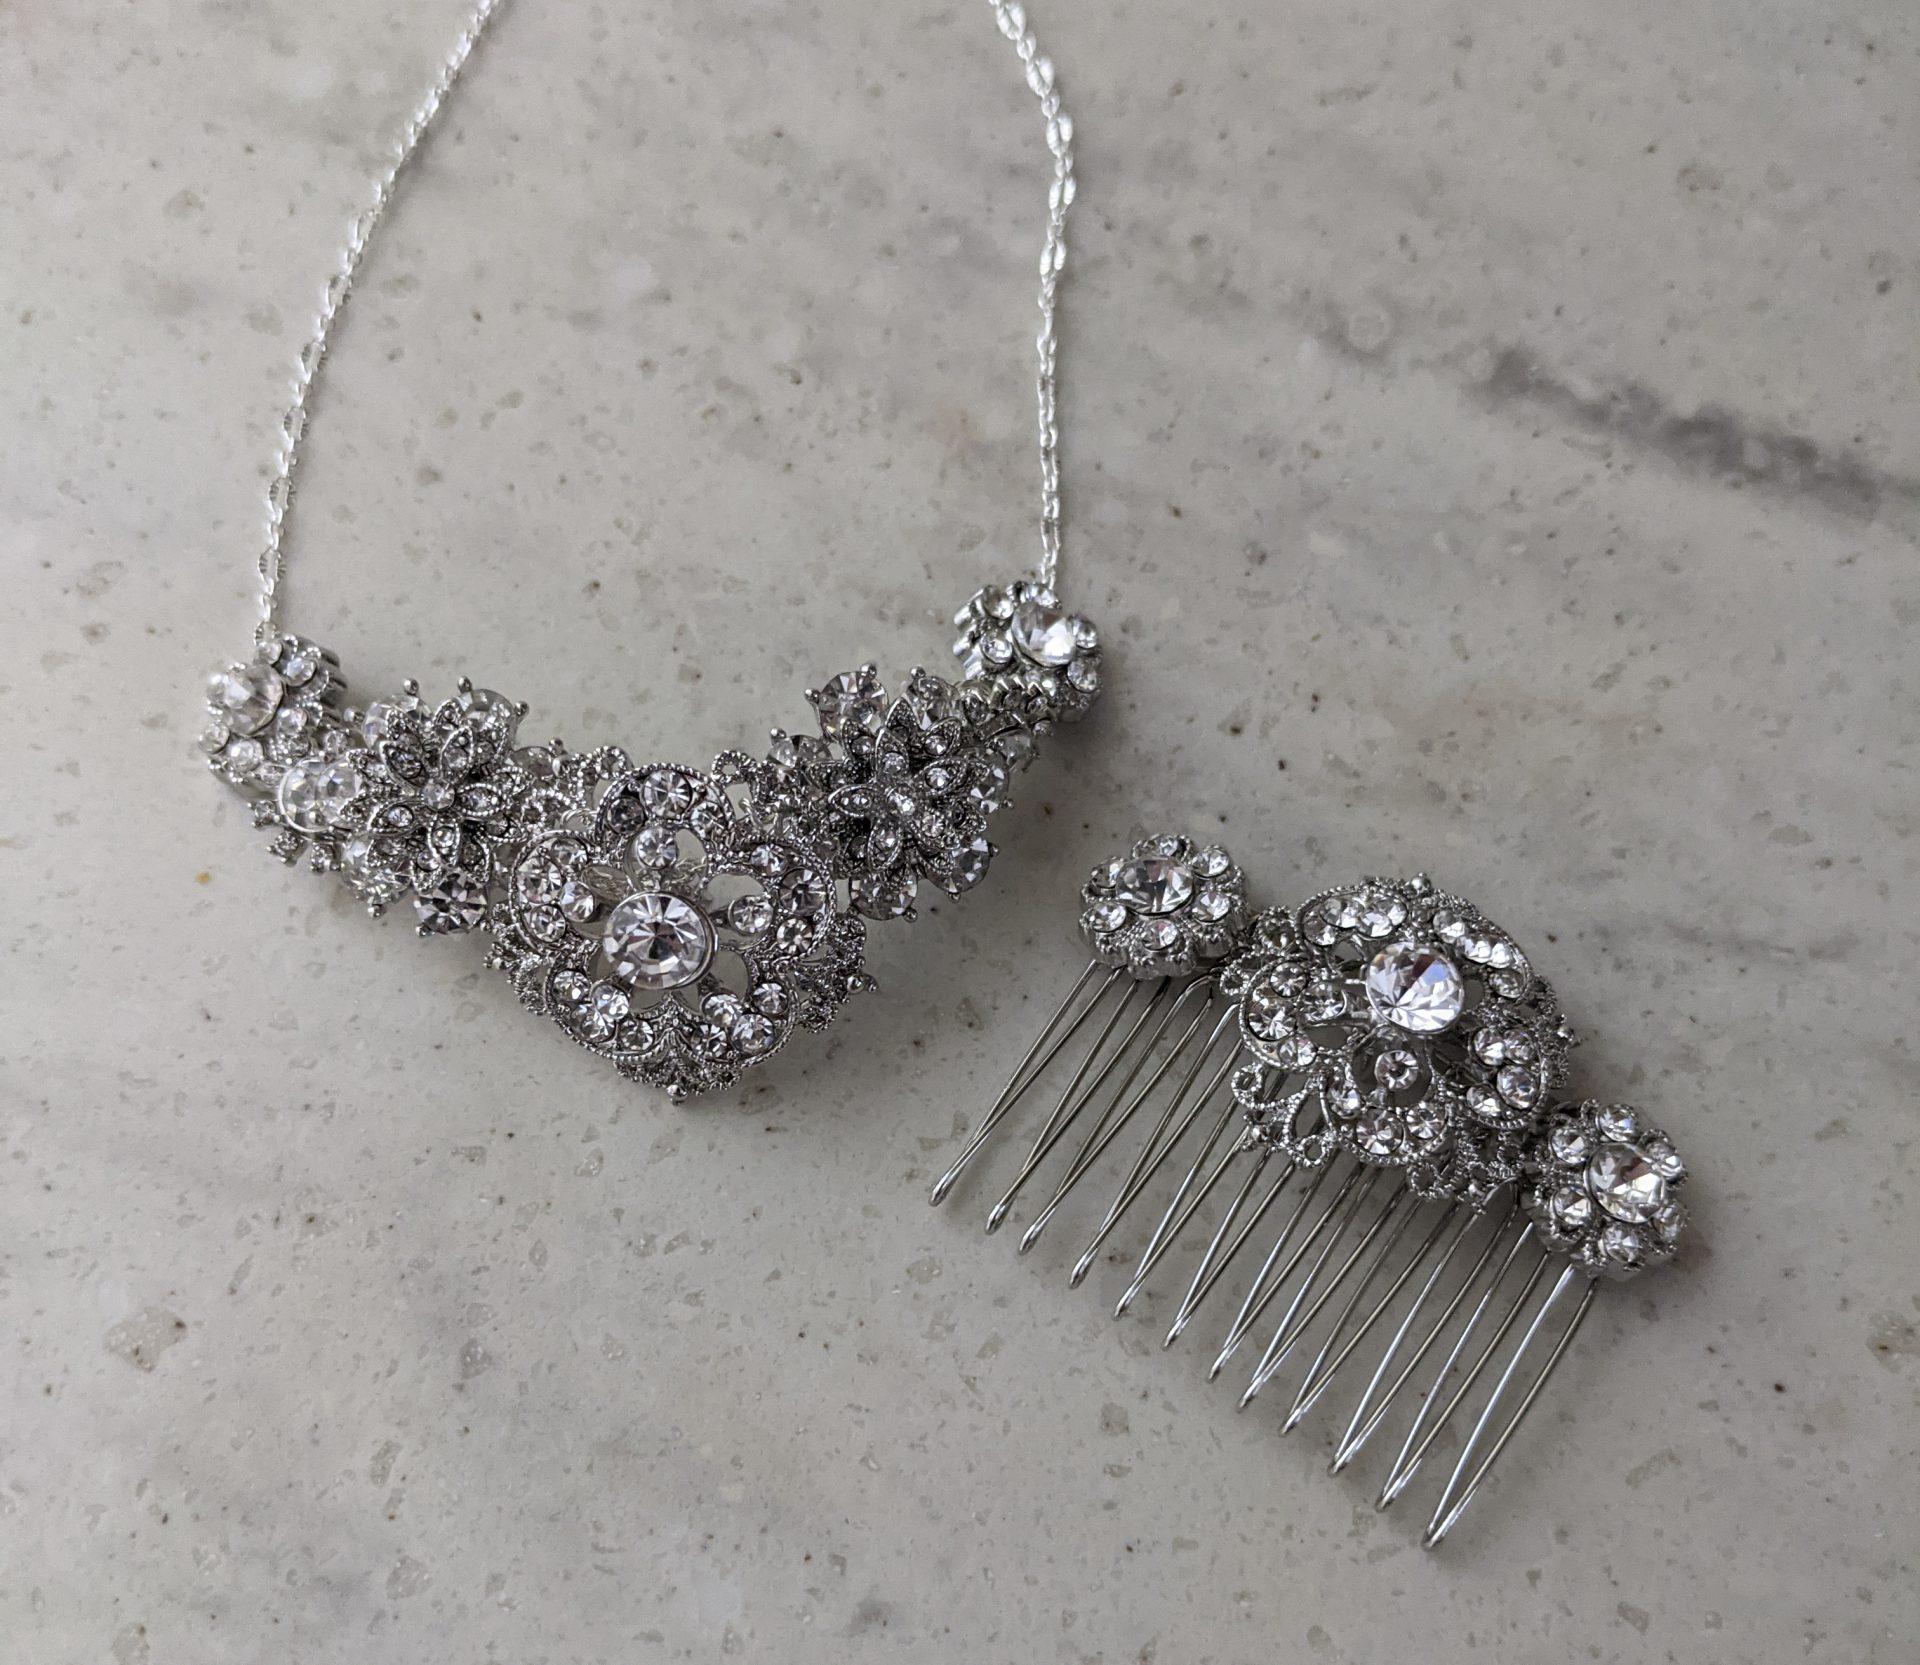 regency era DIY jewelry and hair comb themamavillage.com